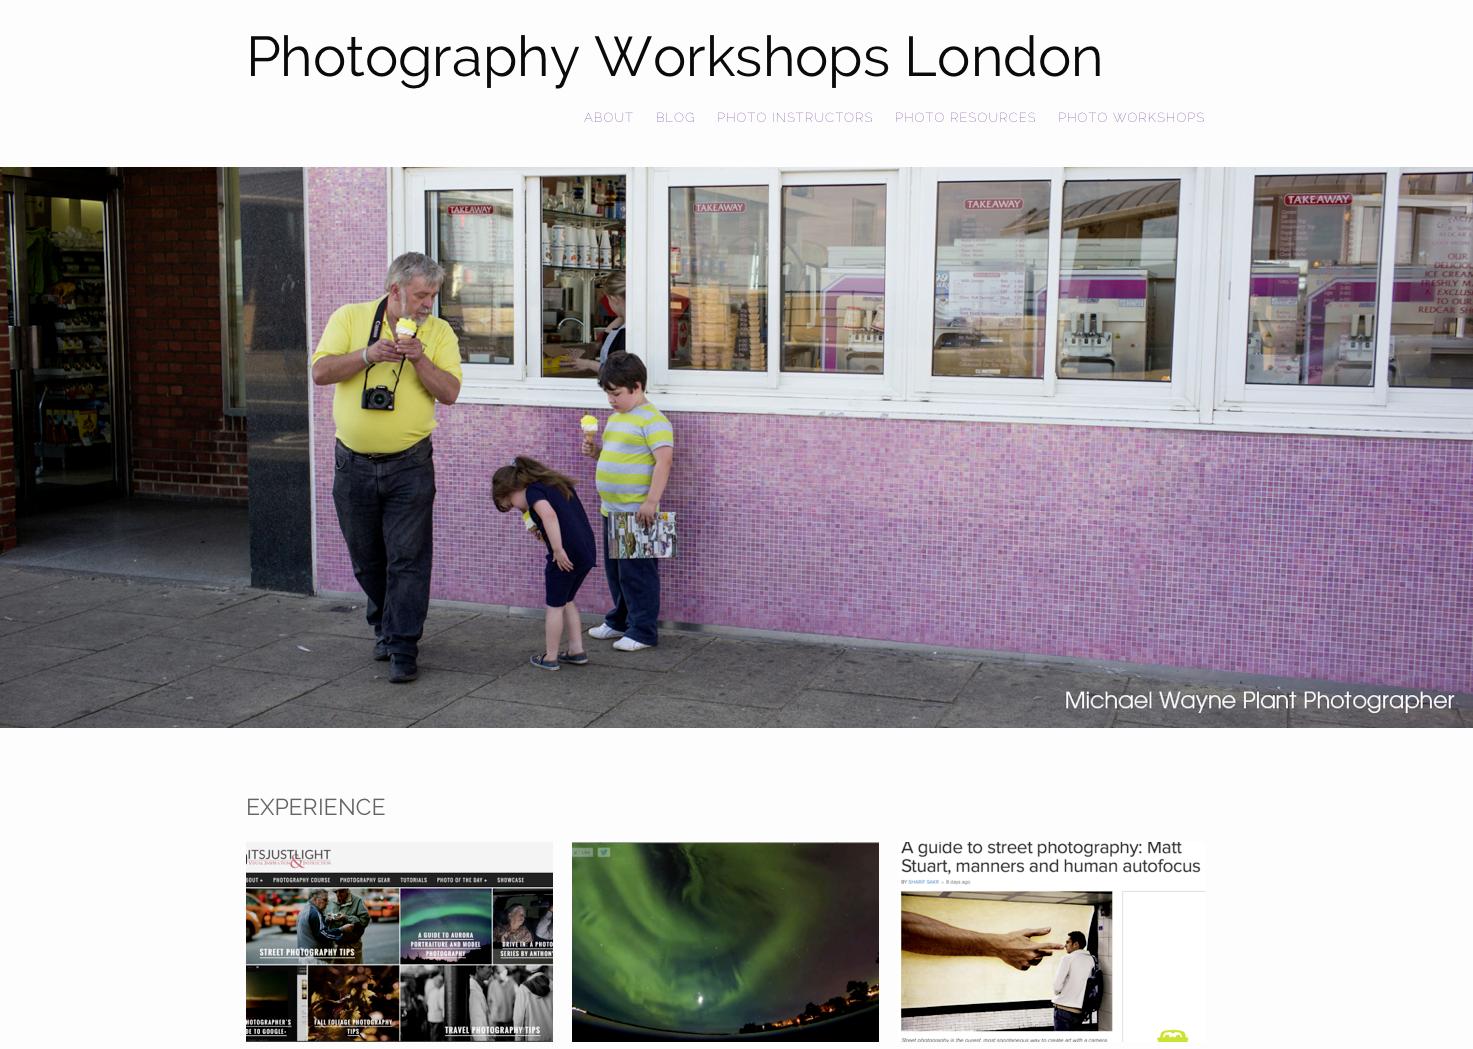 www.photographyworkshopslondon.com